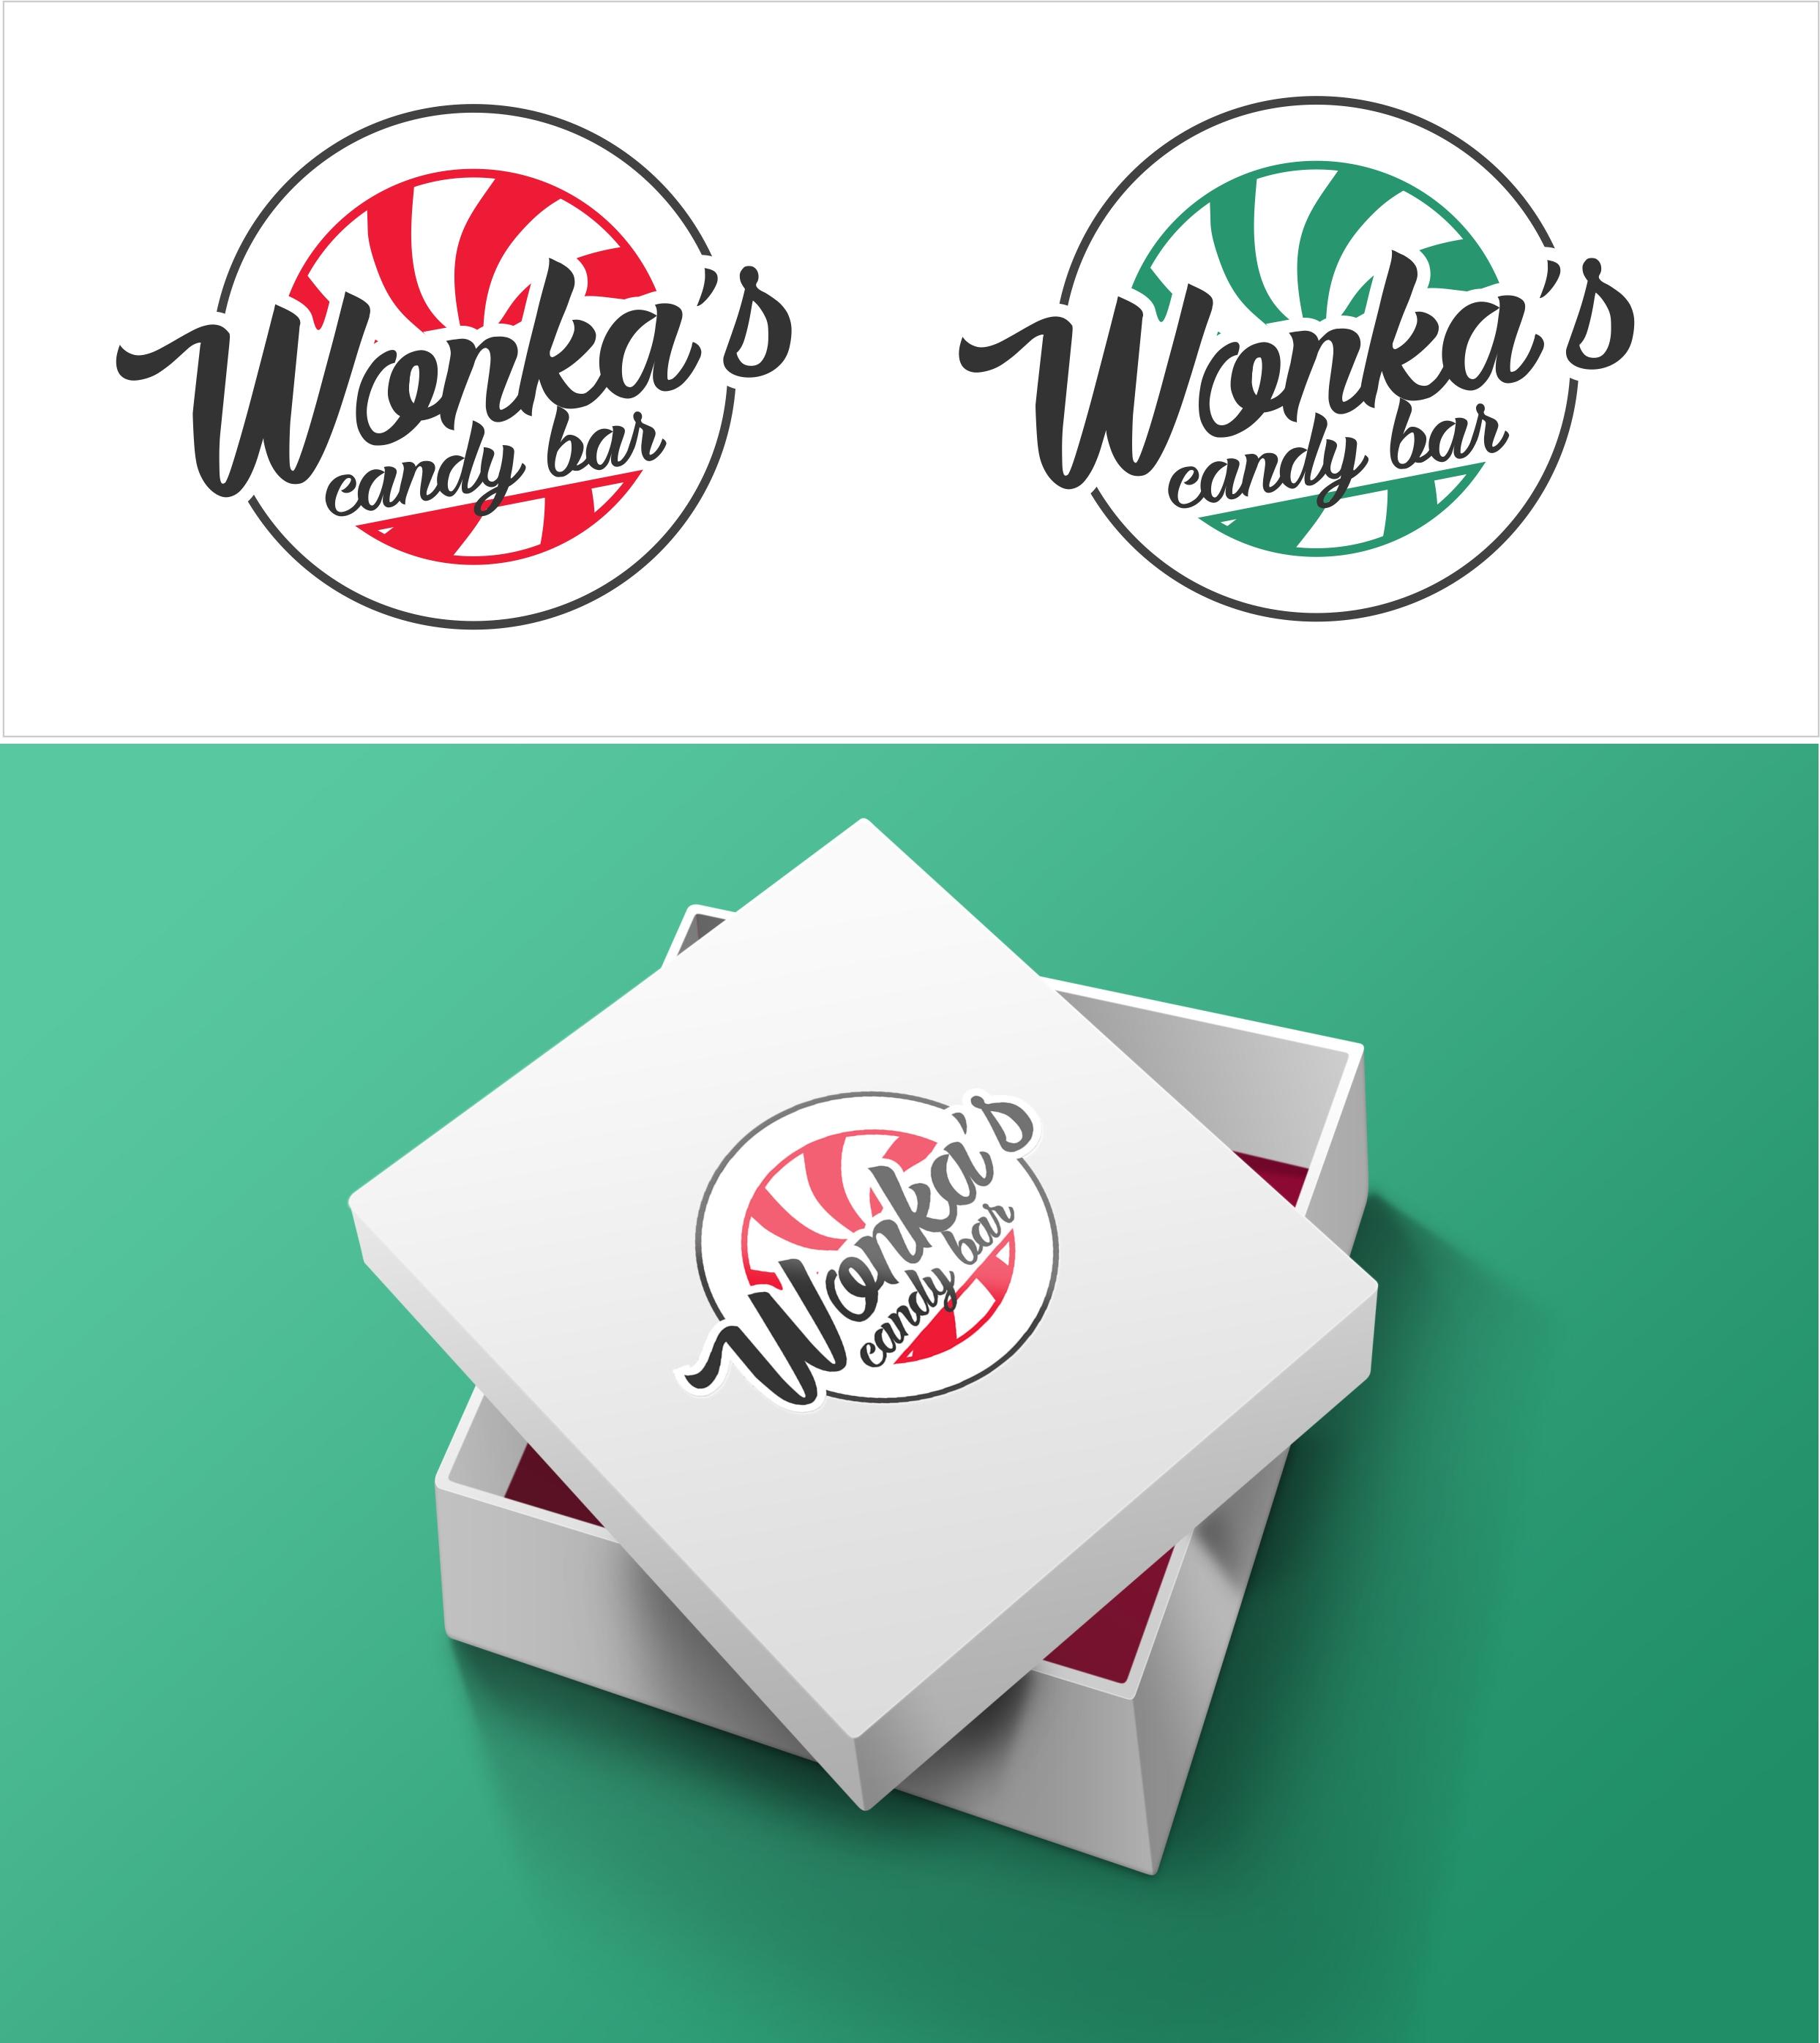 Разработка логотипа магазина сладостей со всего мира. фото f_3735a2a8e545d993.jpg